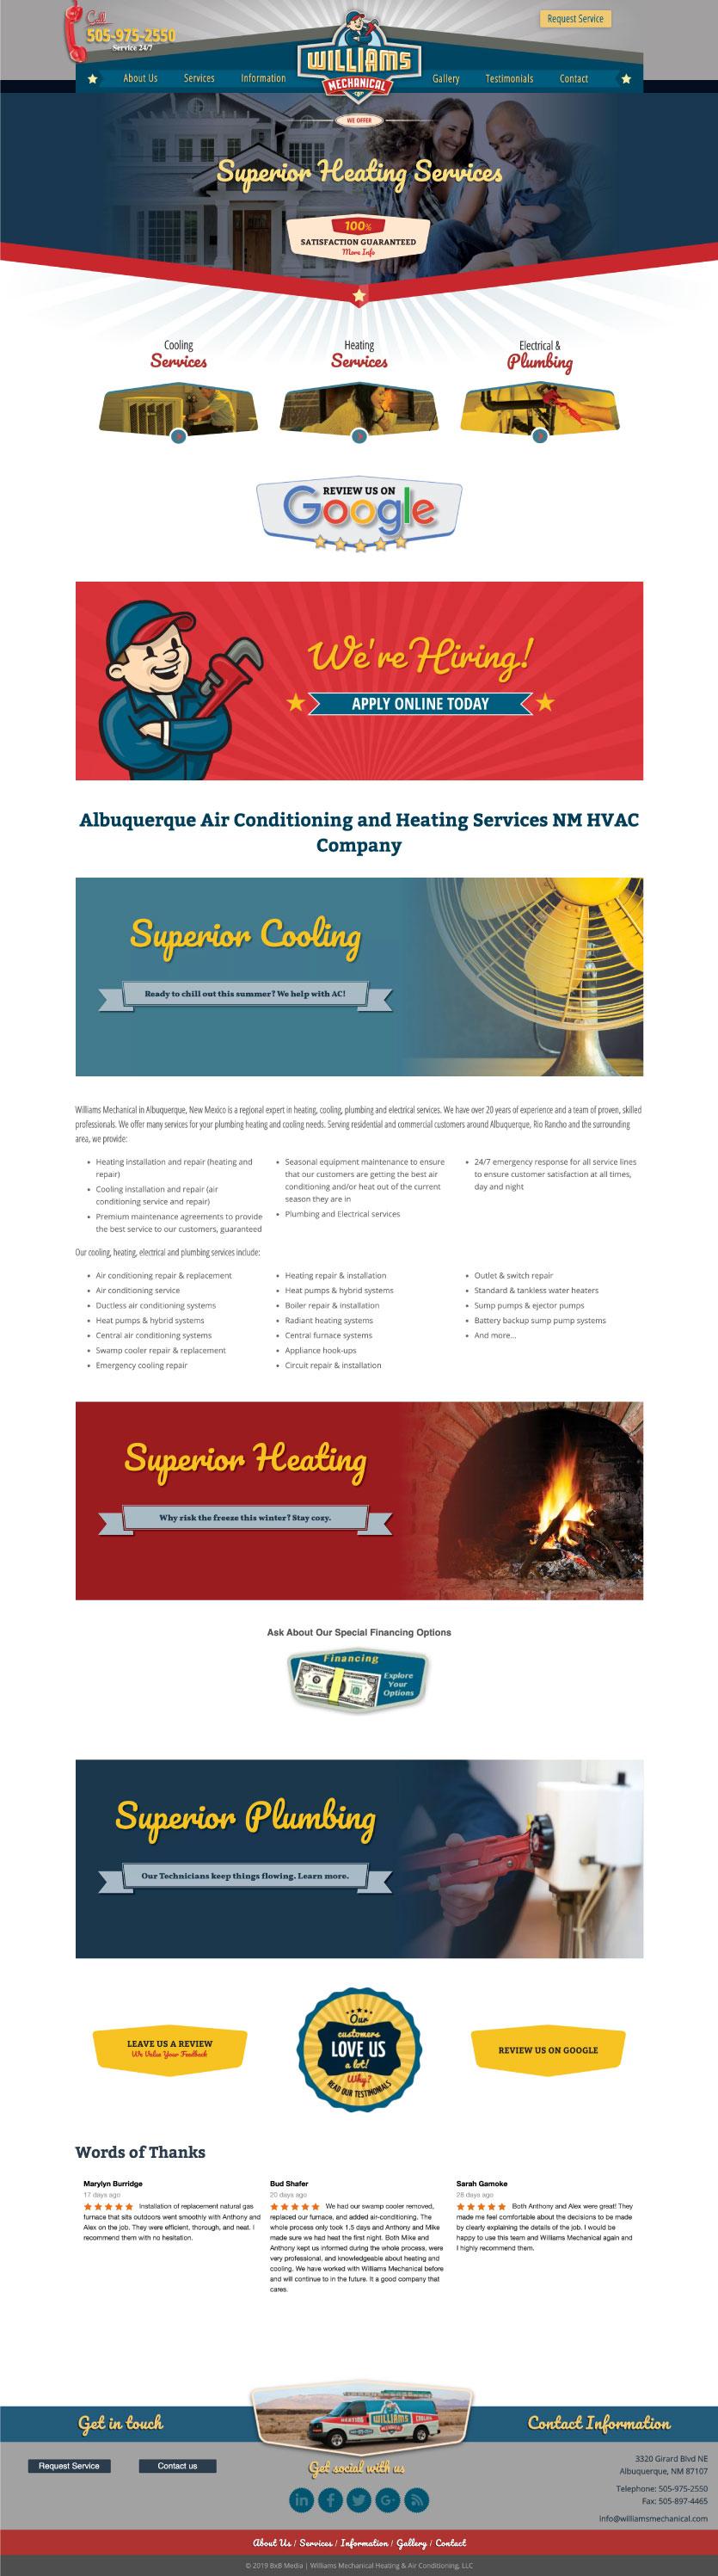 Web Design Plumbing Inspiration